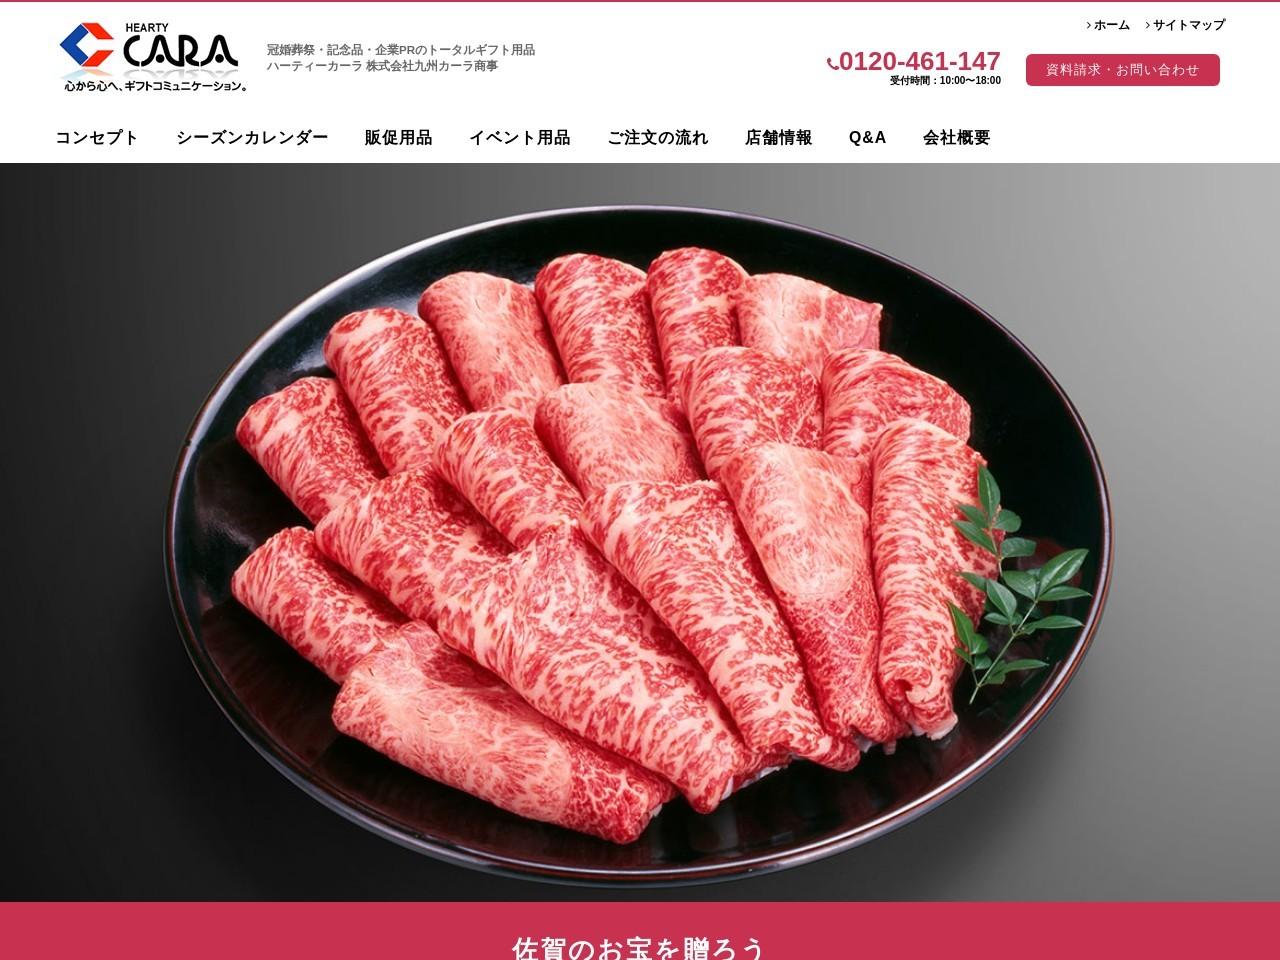 株式会社九州カーラ商事|ホーム